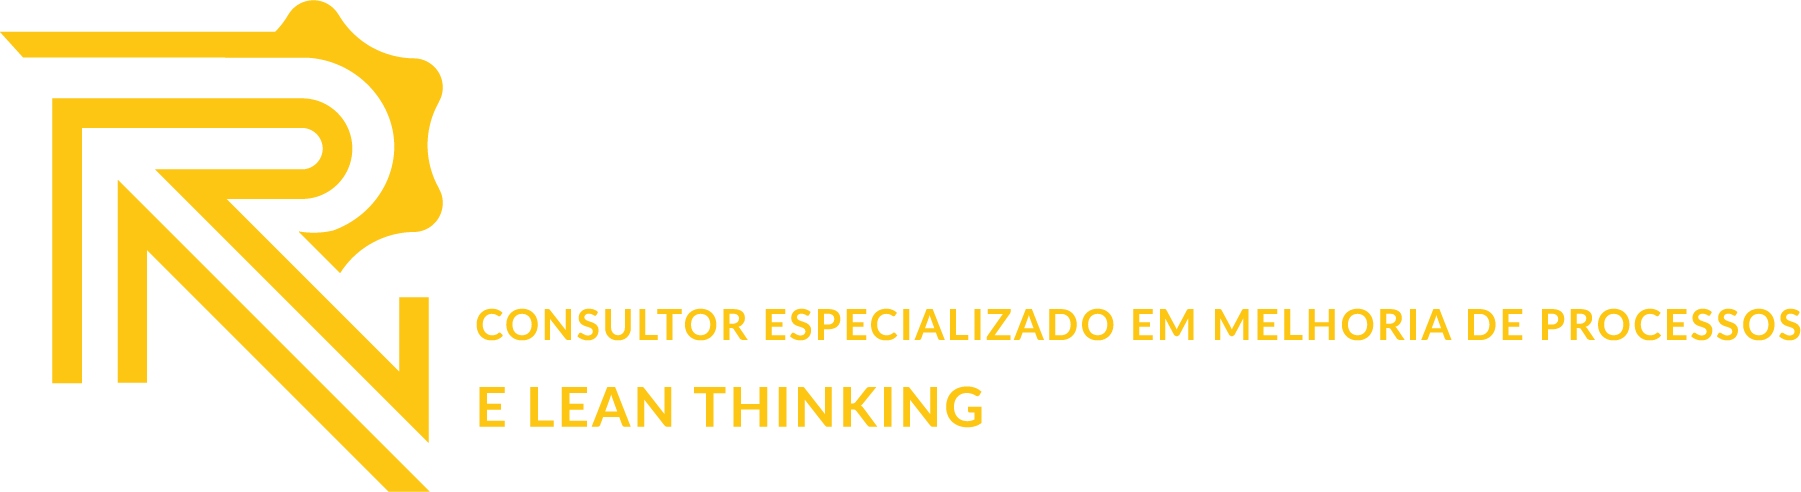 Rafael Noronha Consultoria & Coaching